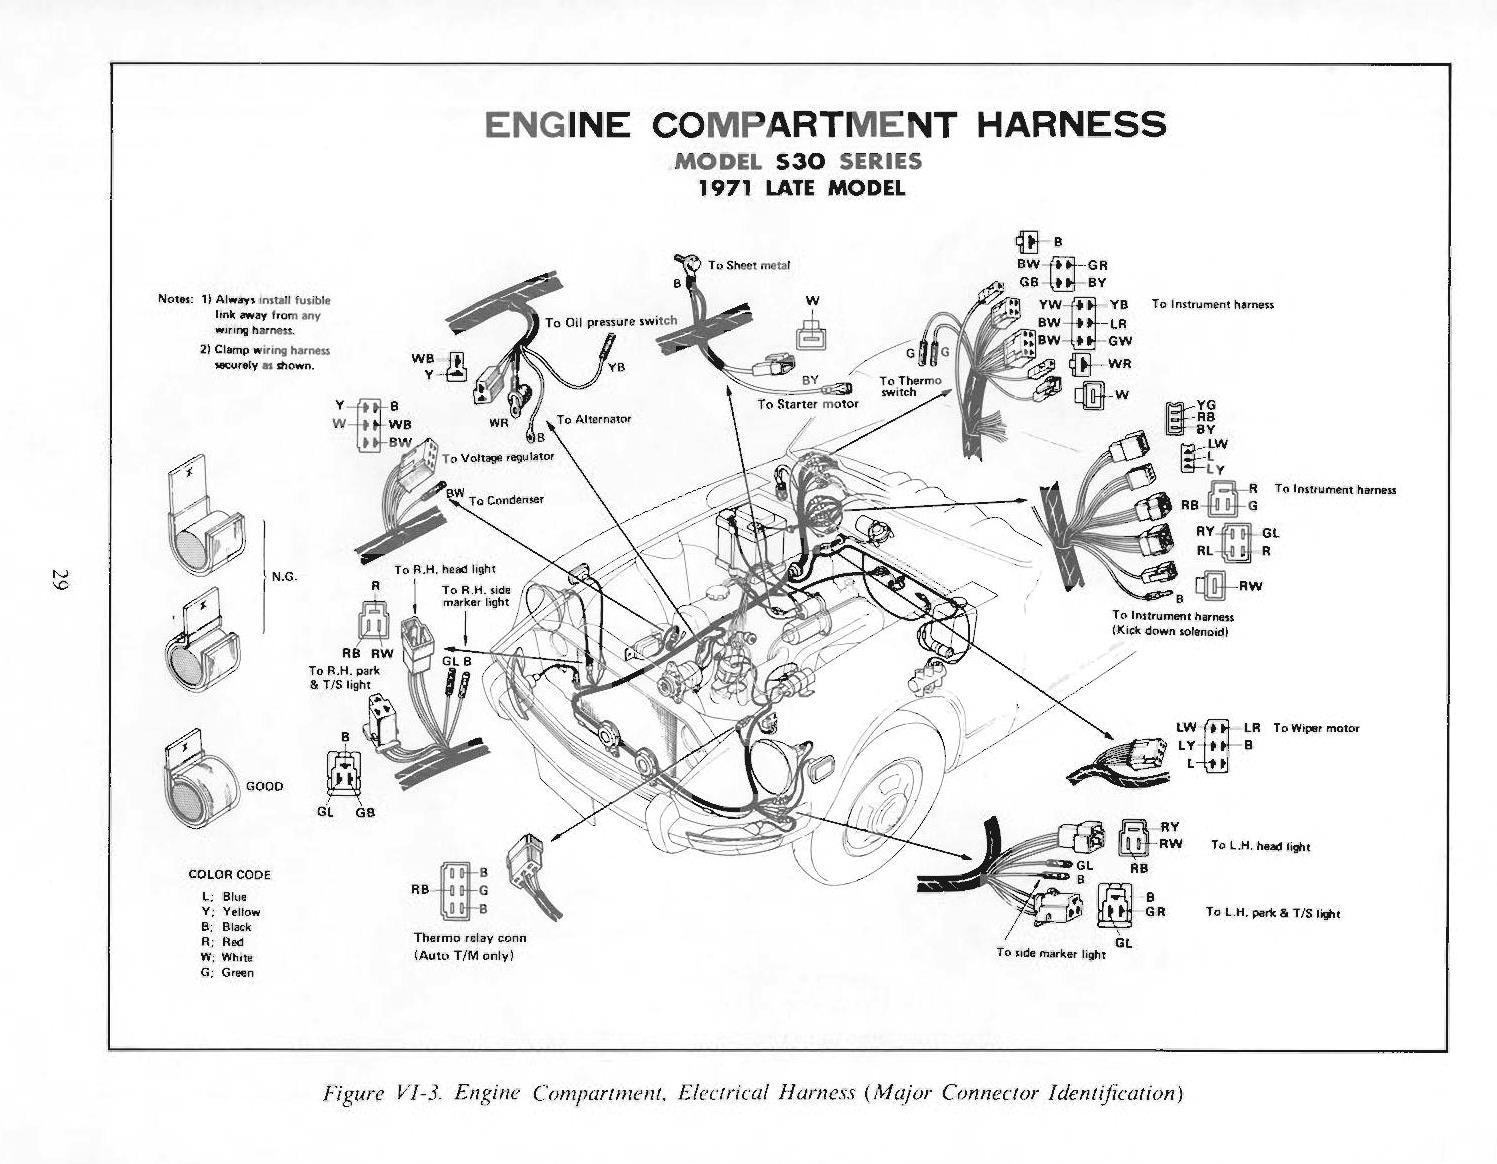 1971 datsun 510 wiring diagram light diagrams 72 240z harness engine elsavadorla